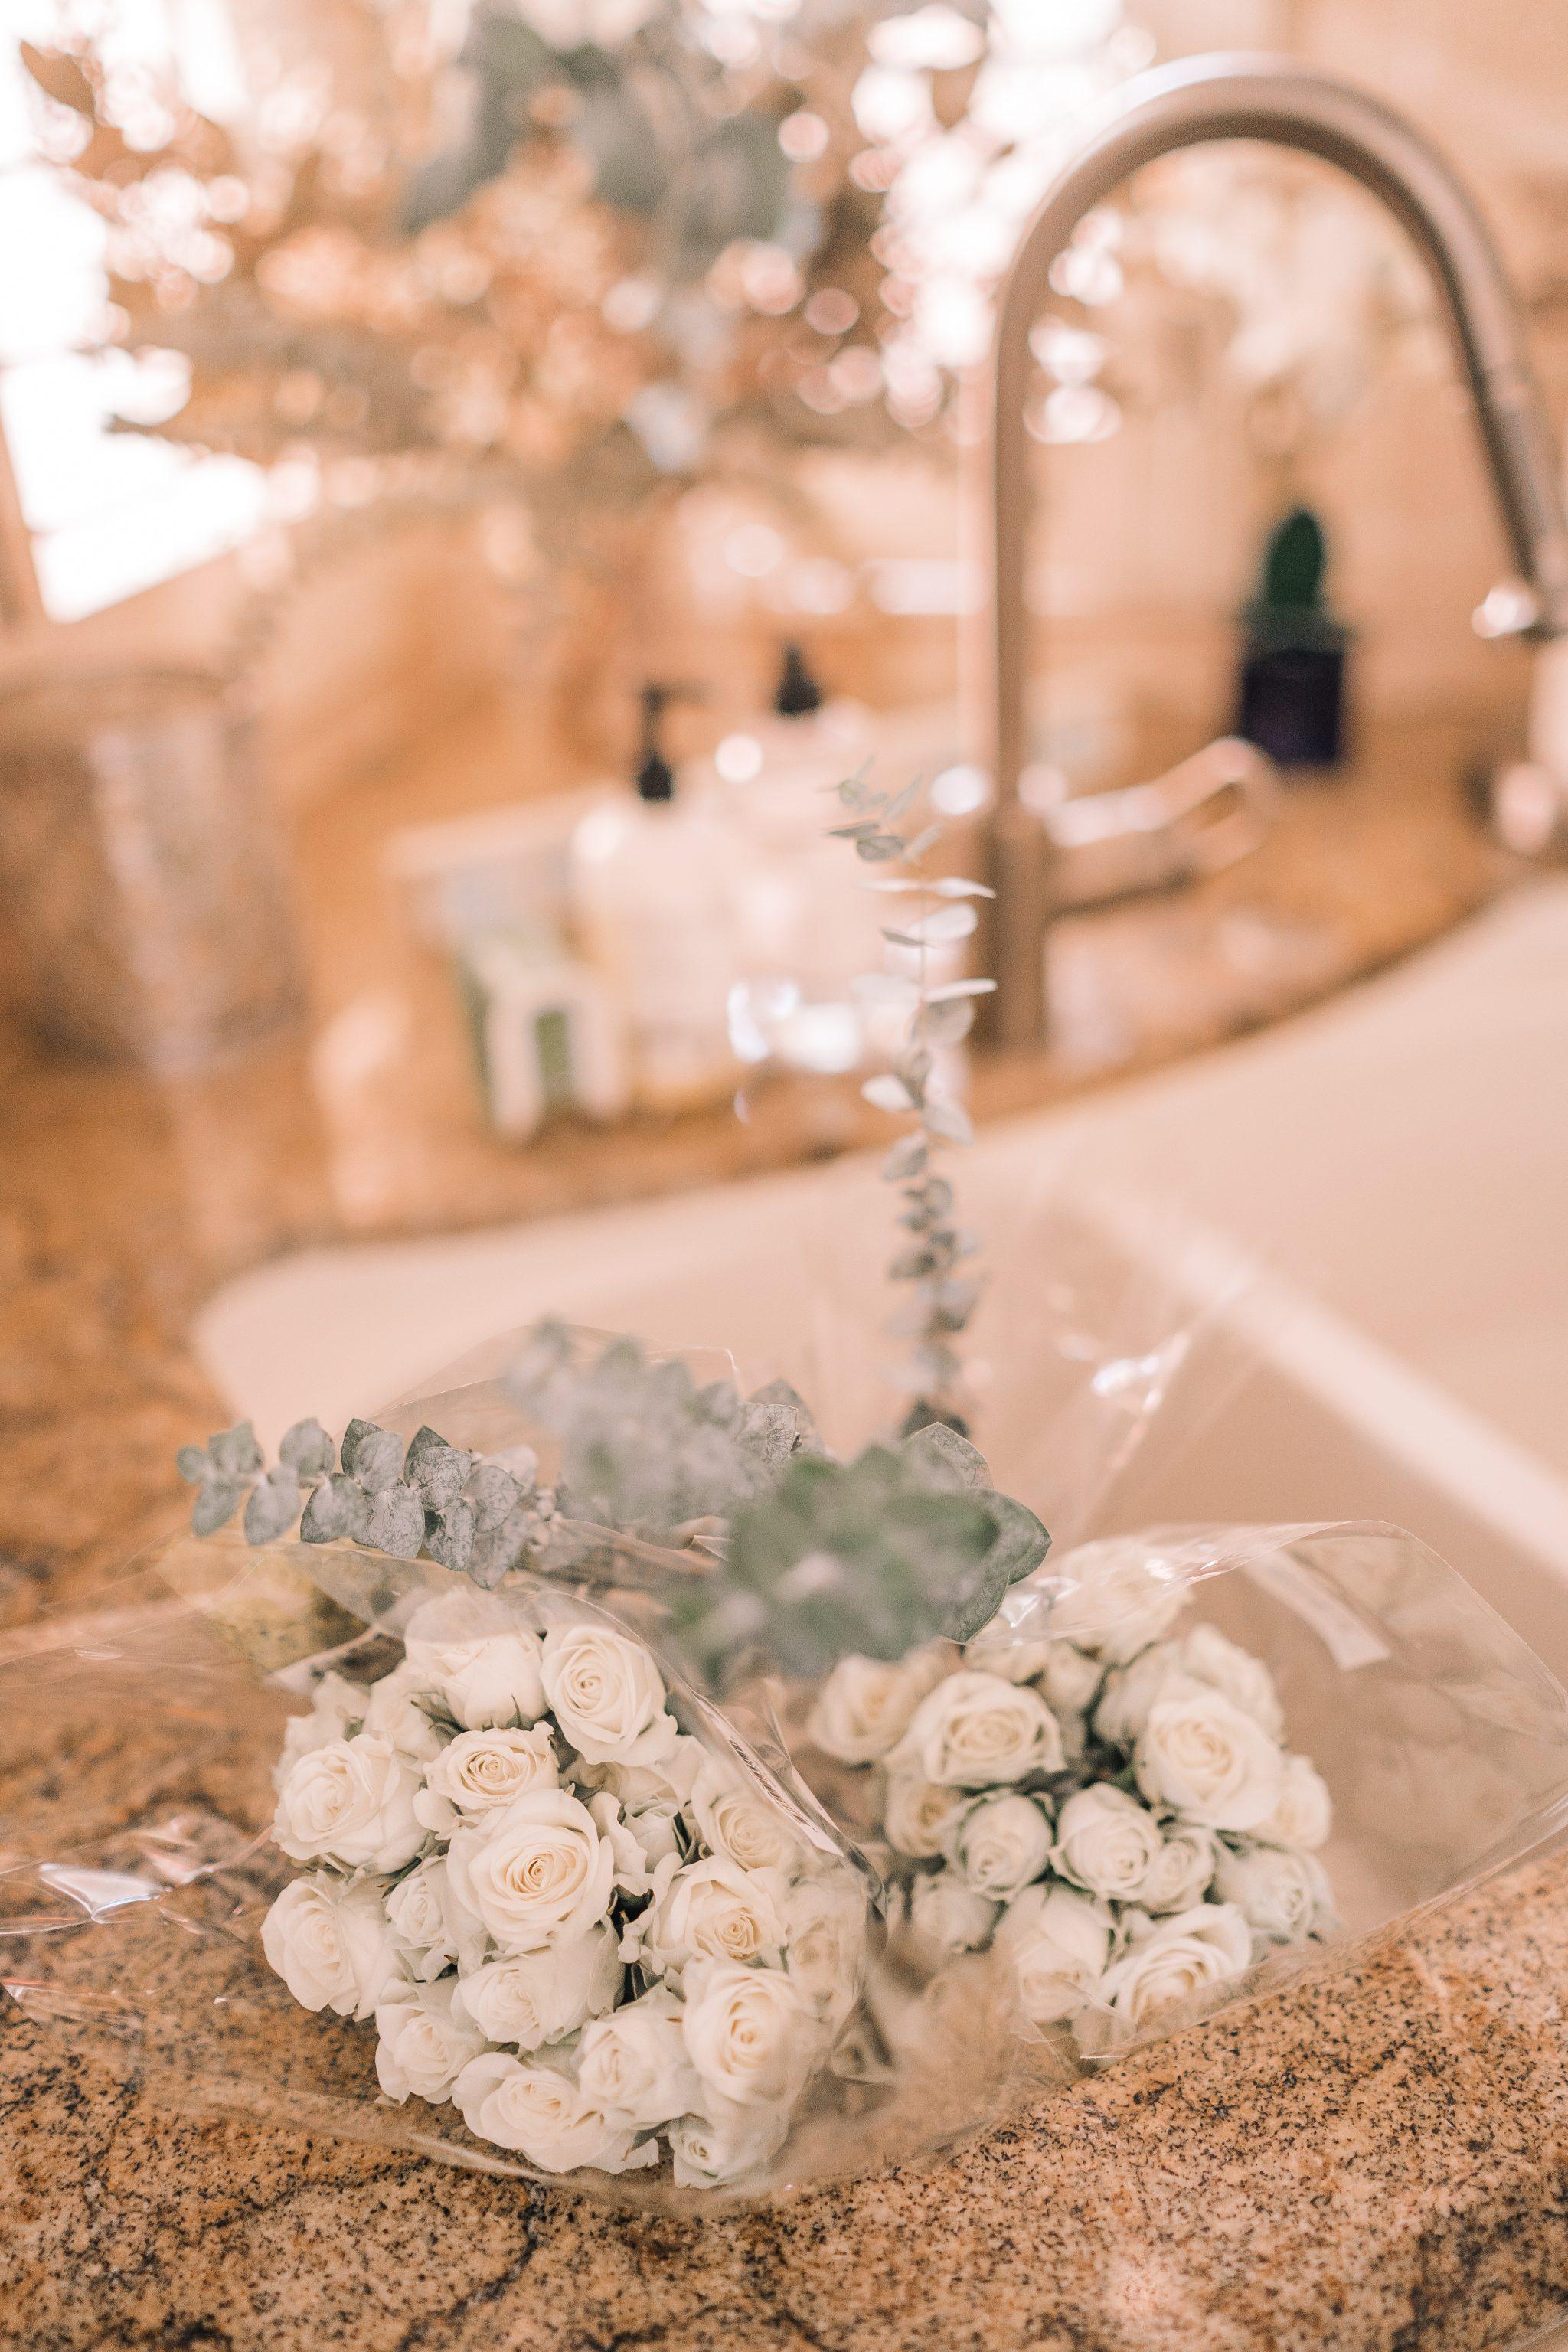 DIY Trader Joe's flower arrangements